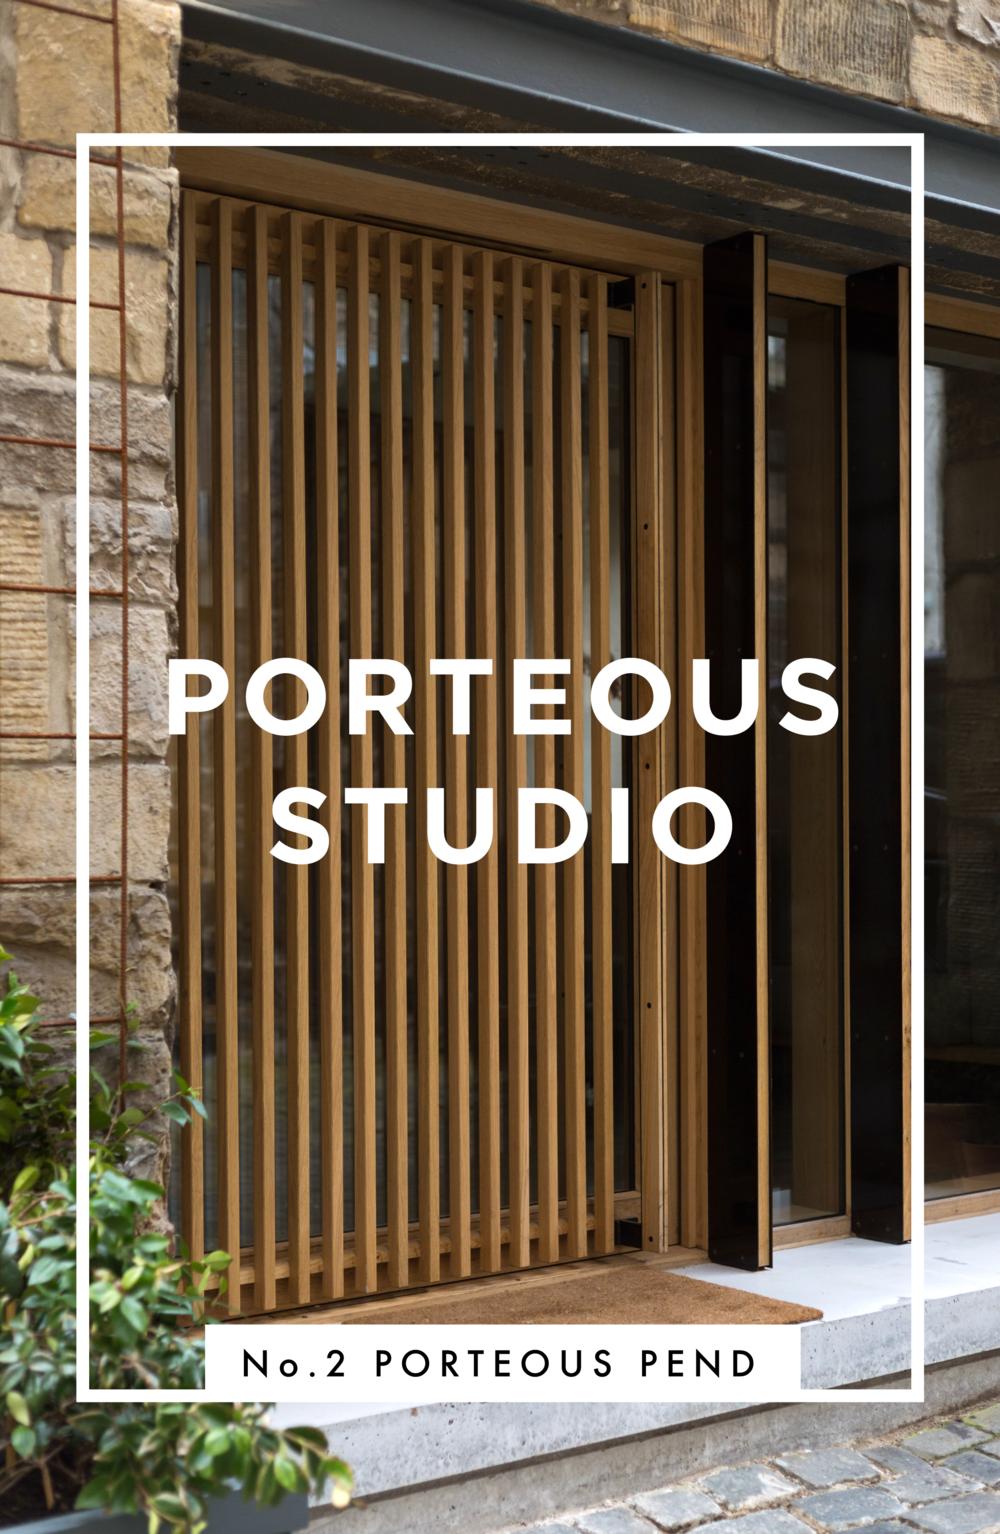 Porteous Studio.png